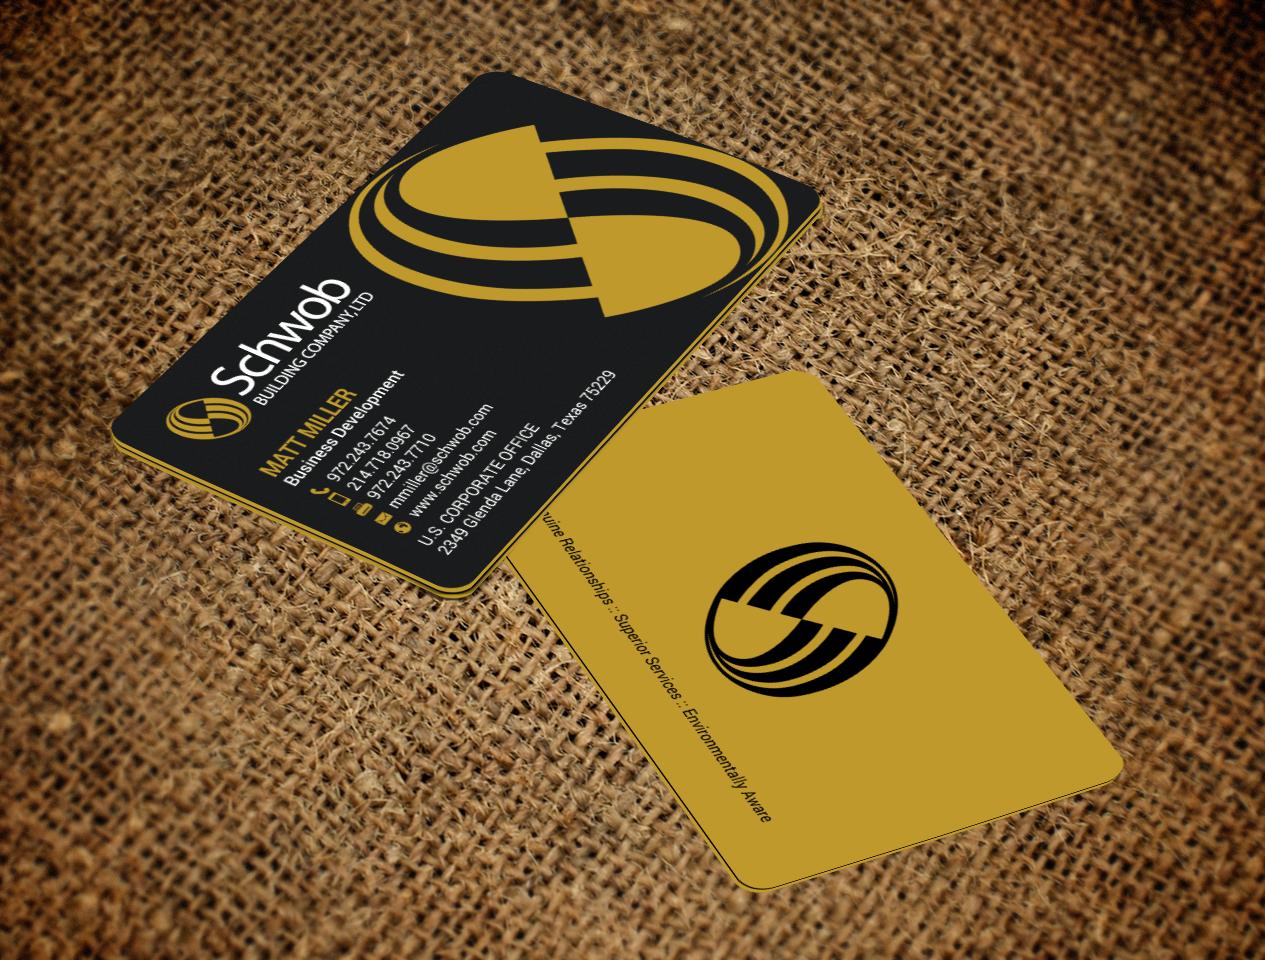 Bold serious construction company business card design for schwob bold serious construction company business card design for schwob companies in united states design 17059576 colourmoves